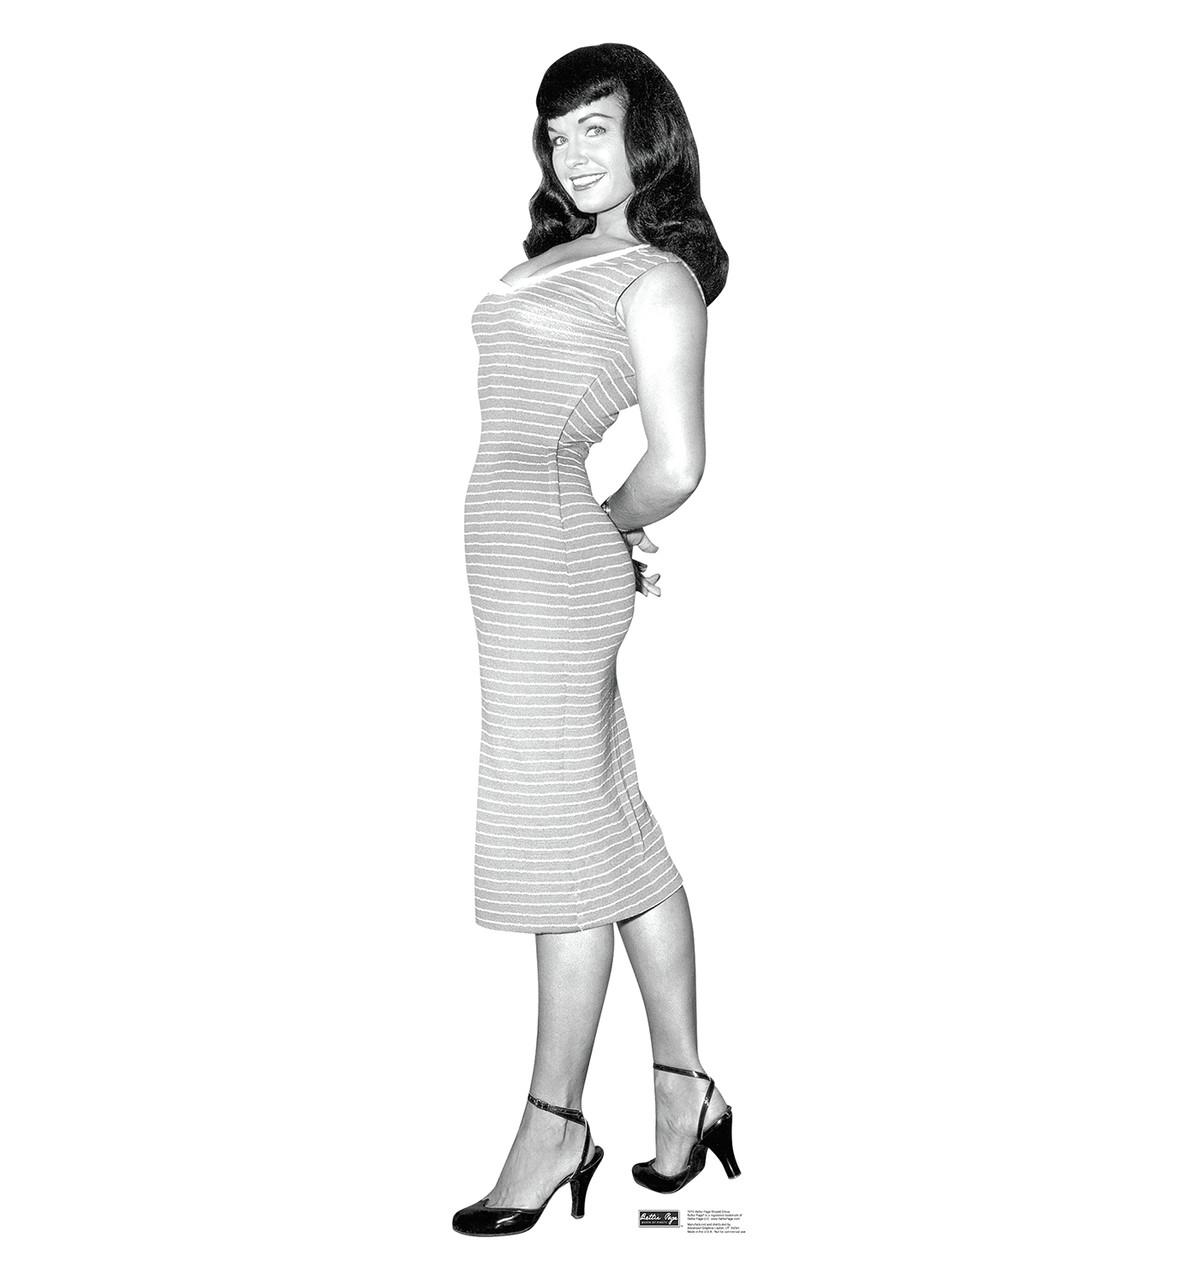 Life-size Bettie Page - Striped Dress Cardboard Standup | Cardboard Cutout